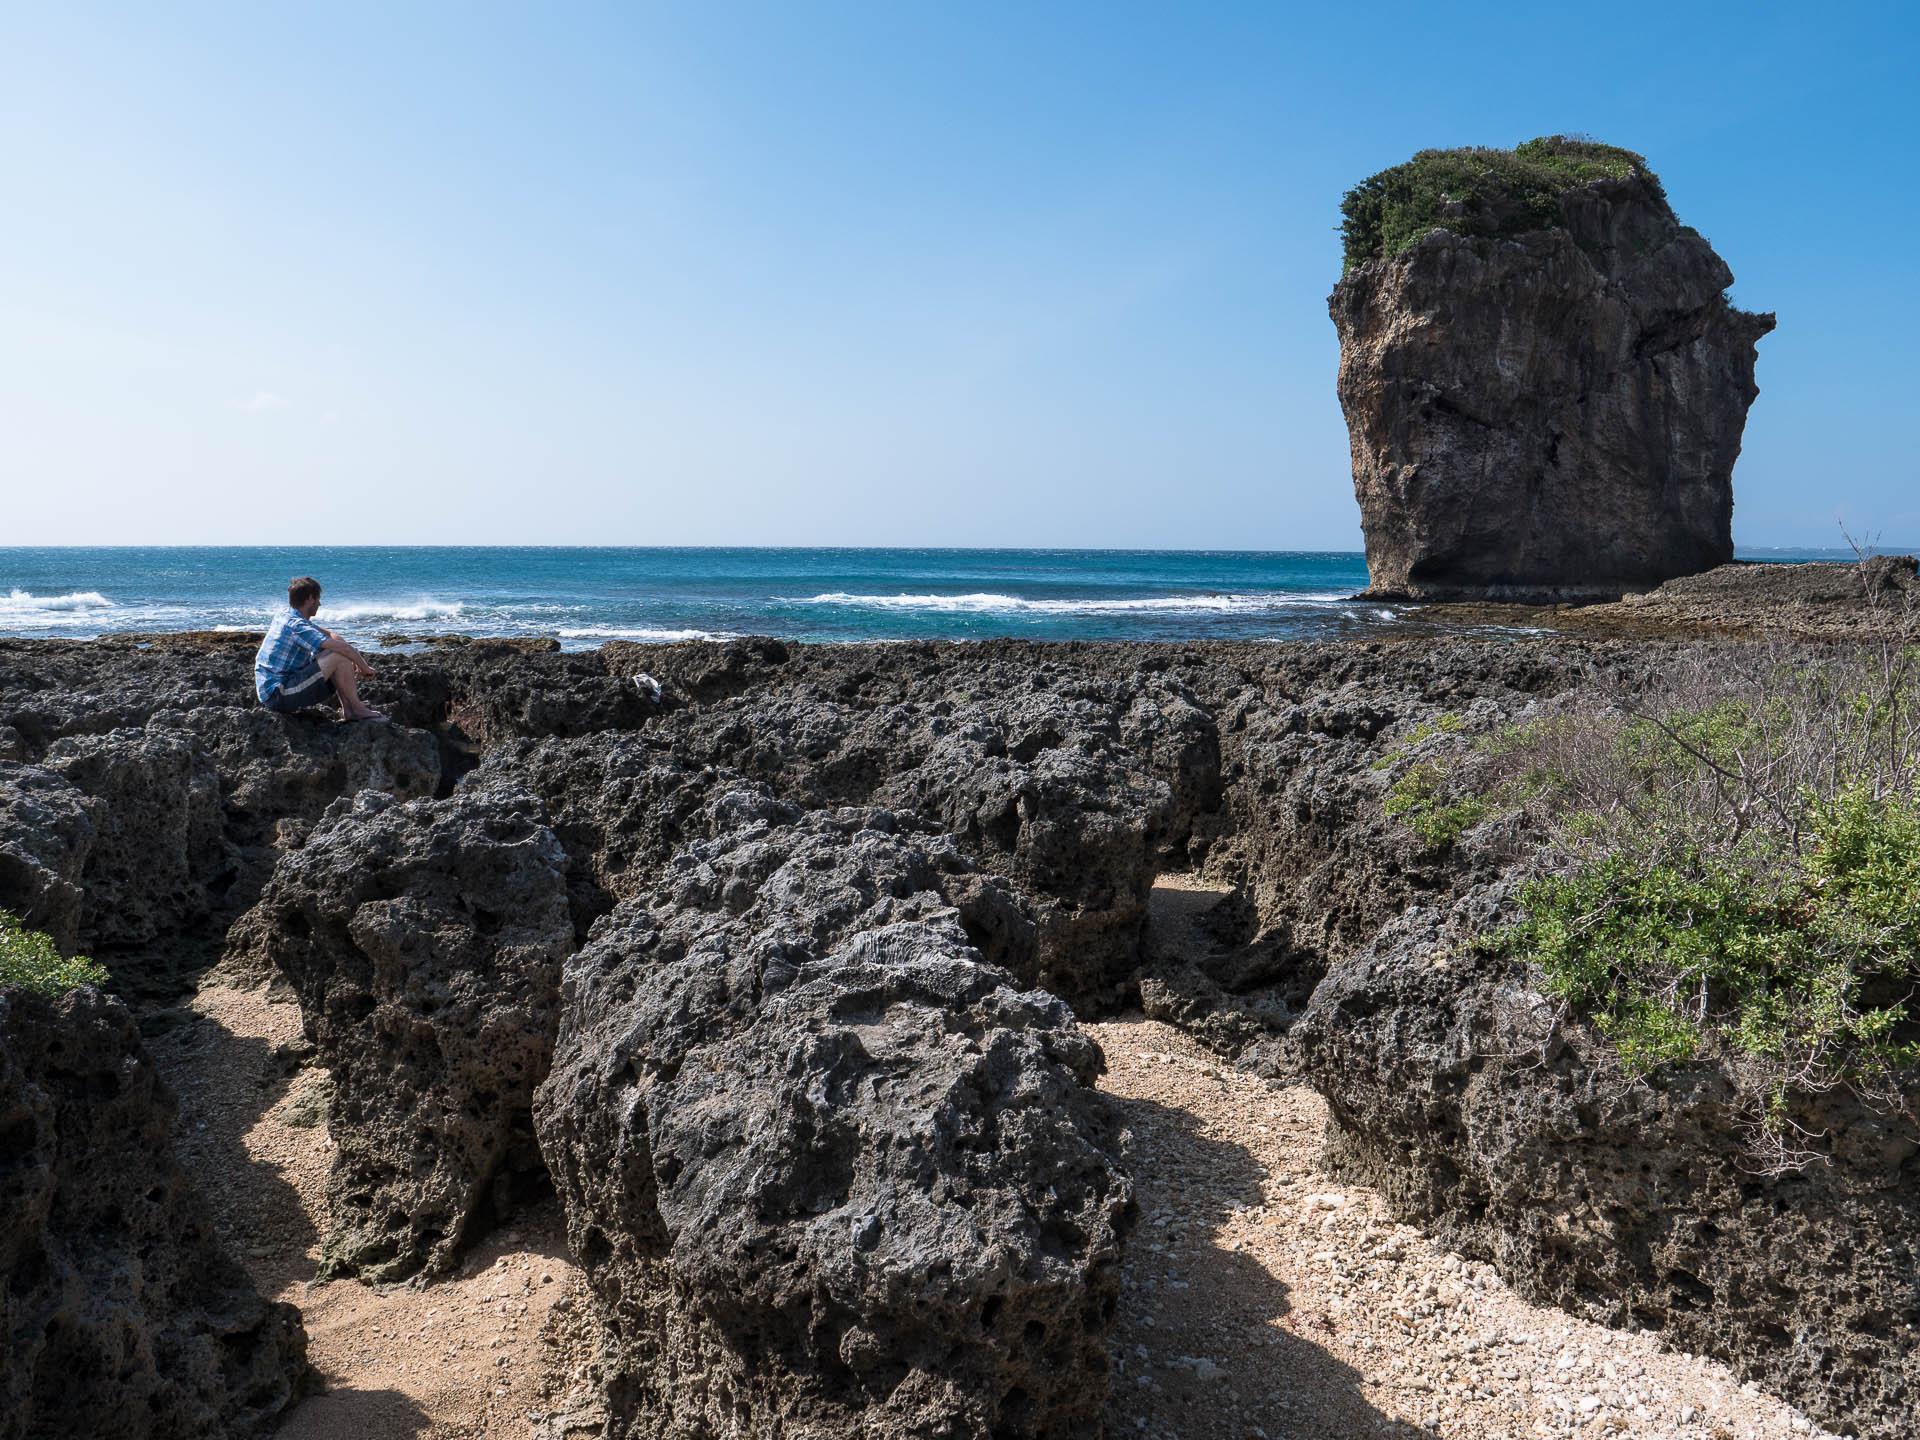 plus belle plage morbihan rencontre africaine france